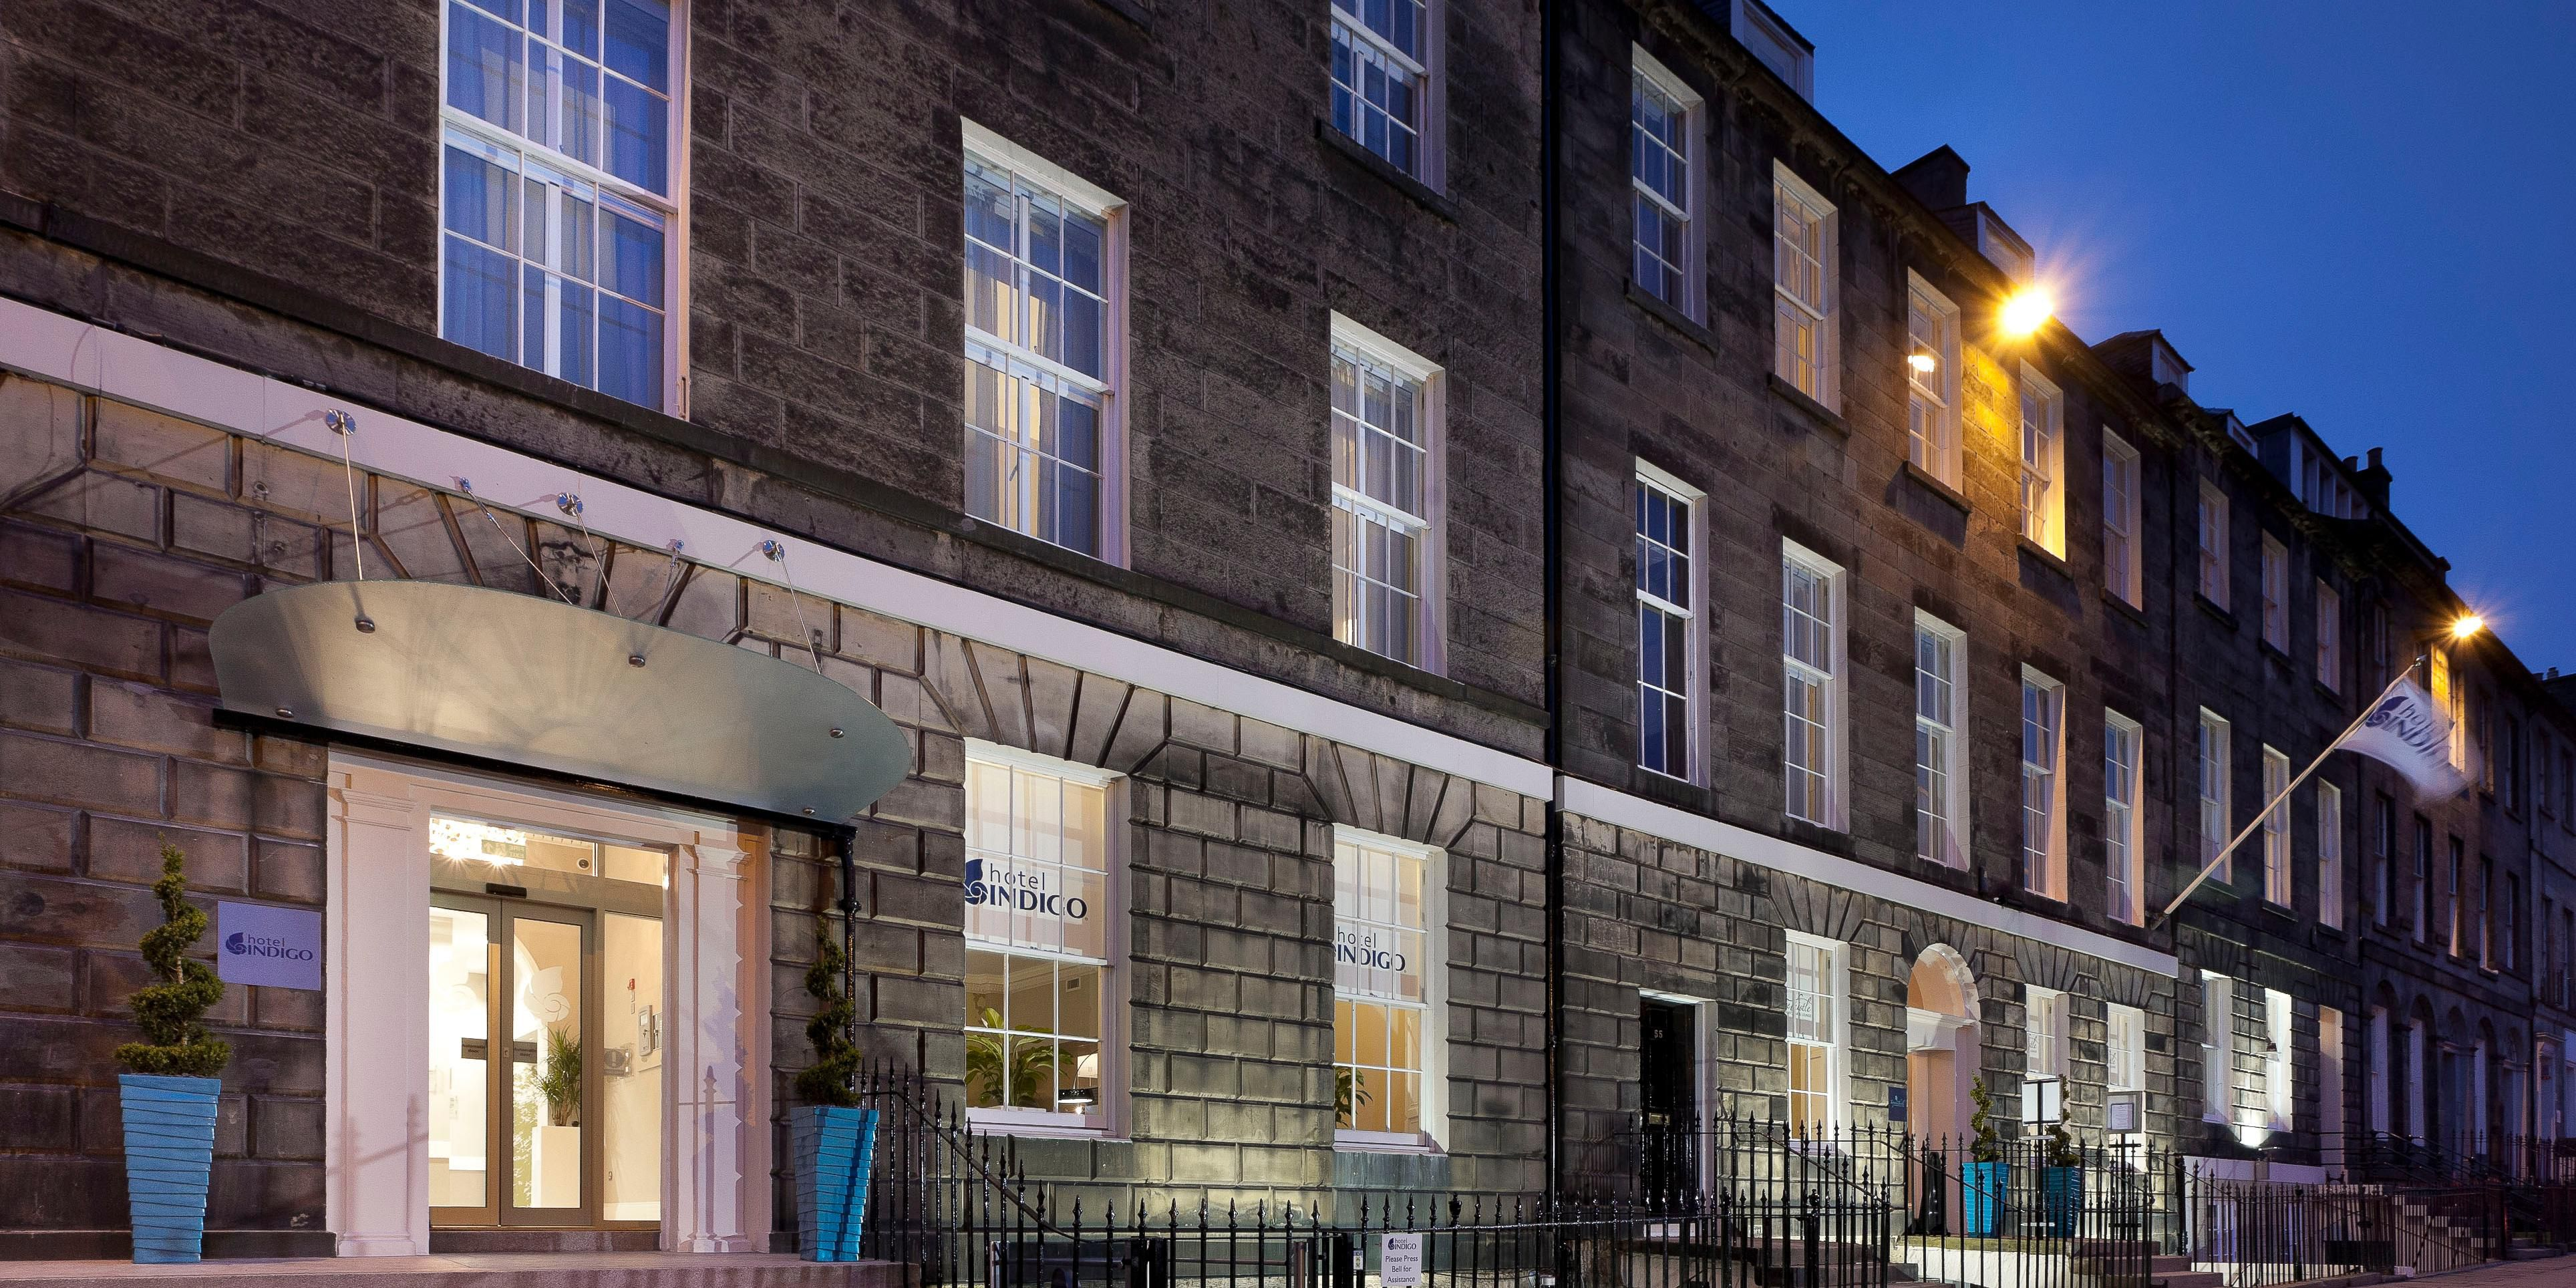 Home Hotel Indigo Edinburgh Hotels Image Banner